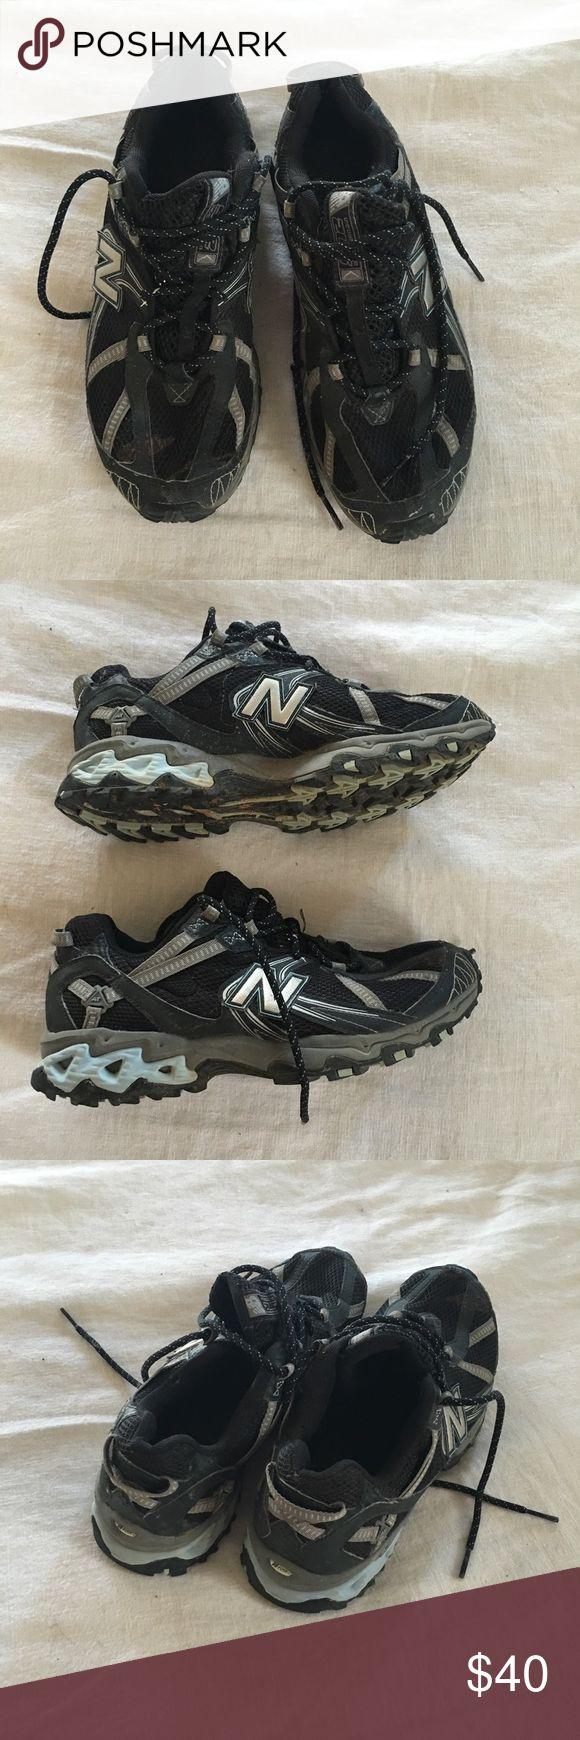 New Balance All Terrain Trail Running Shoes New Balance All Terrain shoes. Trail Running Shoes. 572 All Terrain shoe. Women's size 8.5B very little wear. New Balance Shoes